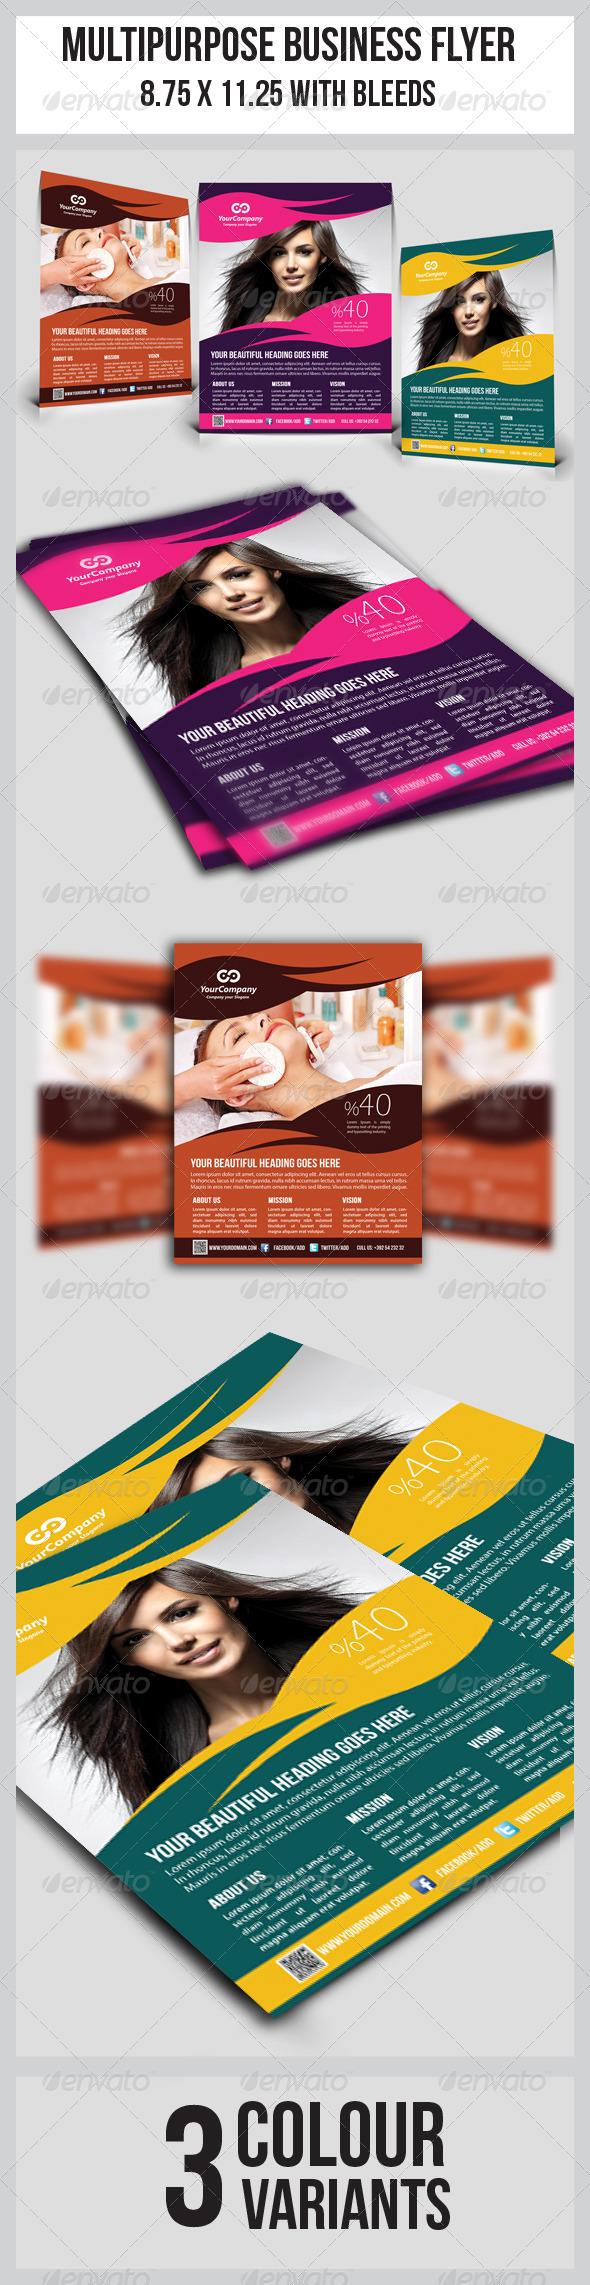 Hair & Beauty Salon Business Flyer - Corporate Flyers